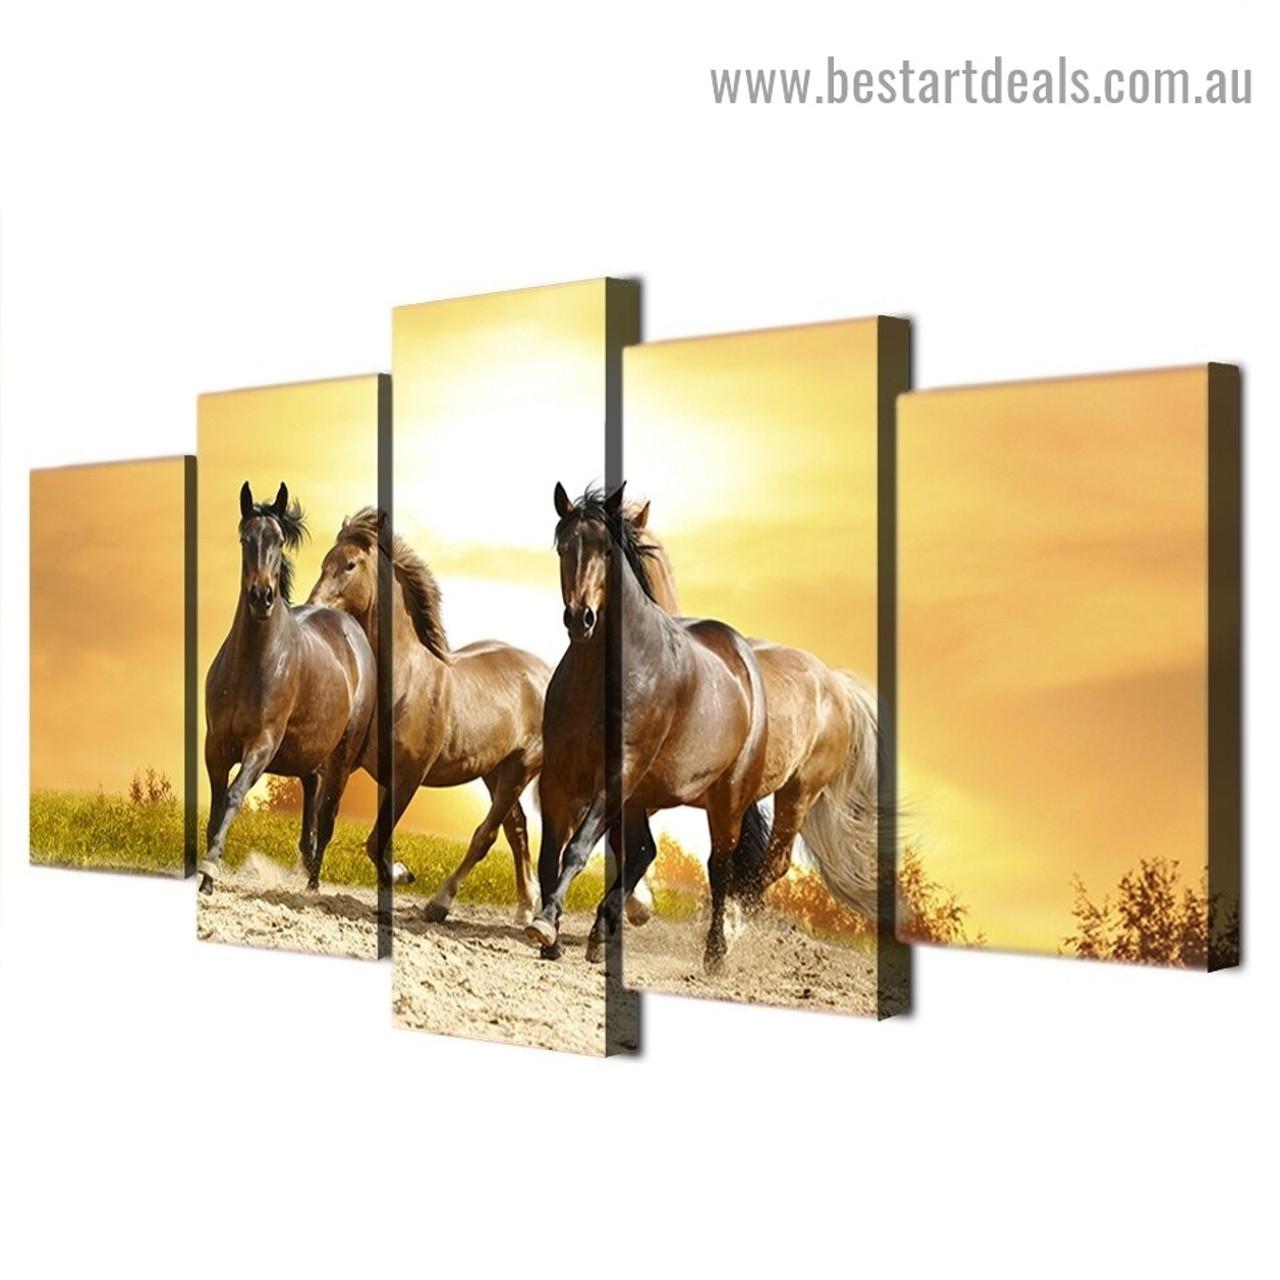 Wild Horses Running Bestartdeals Com Au